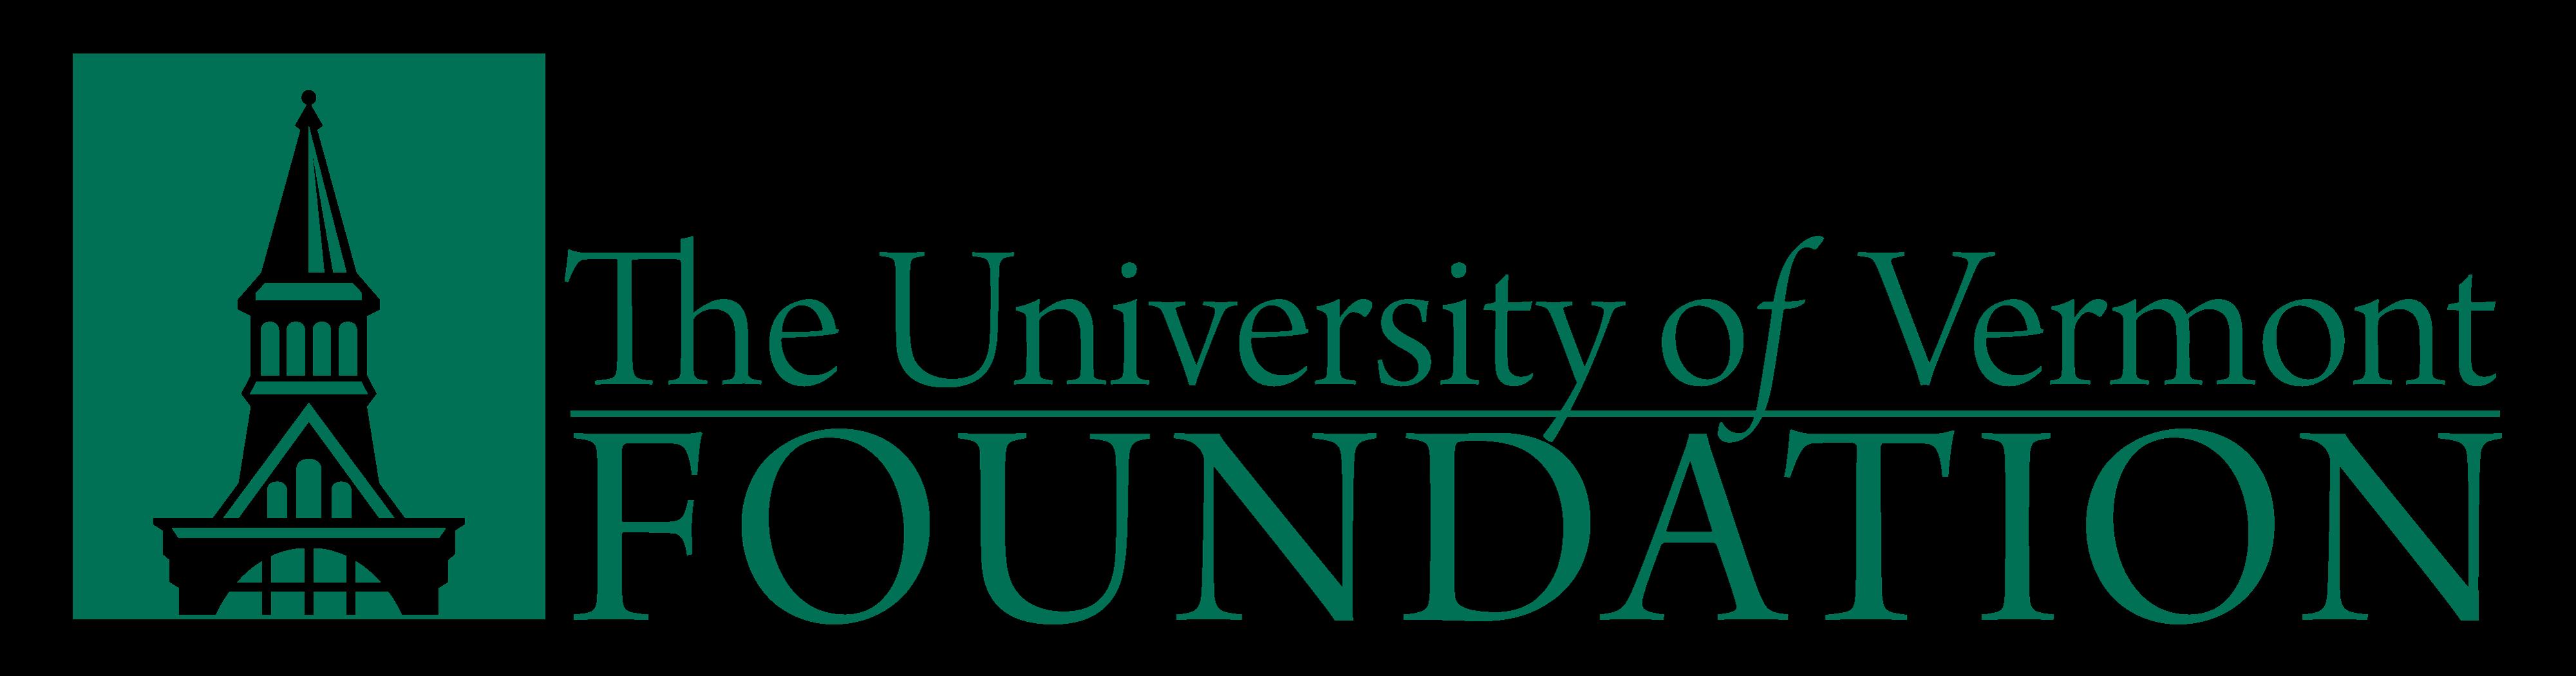 UVMFoundation Logo